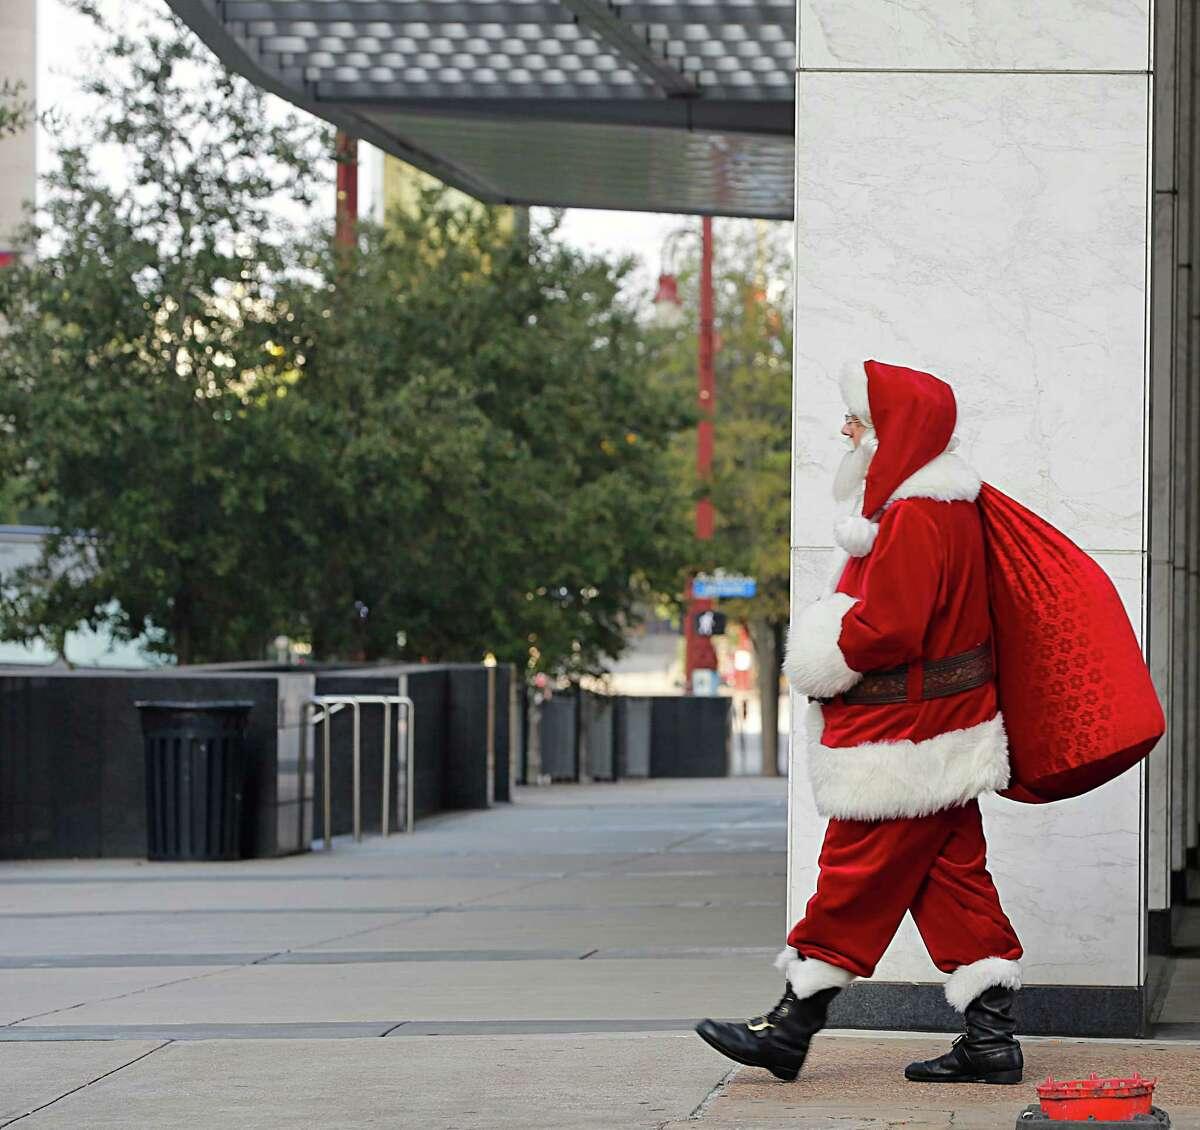 Santa Claus also known as Michael Weinberger walks along Travis street Thursday, Dec. 24, 2015, in Houston.